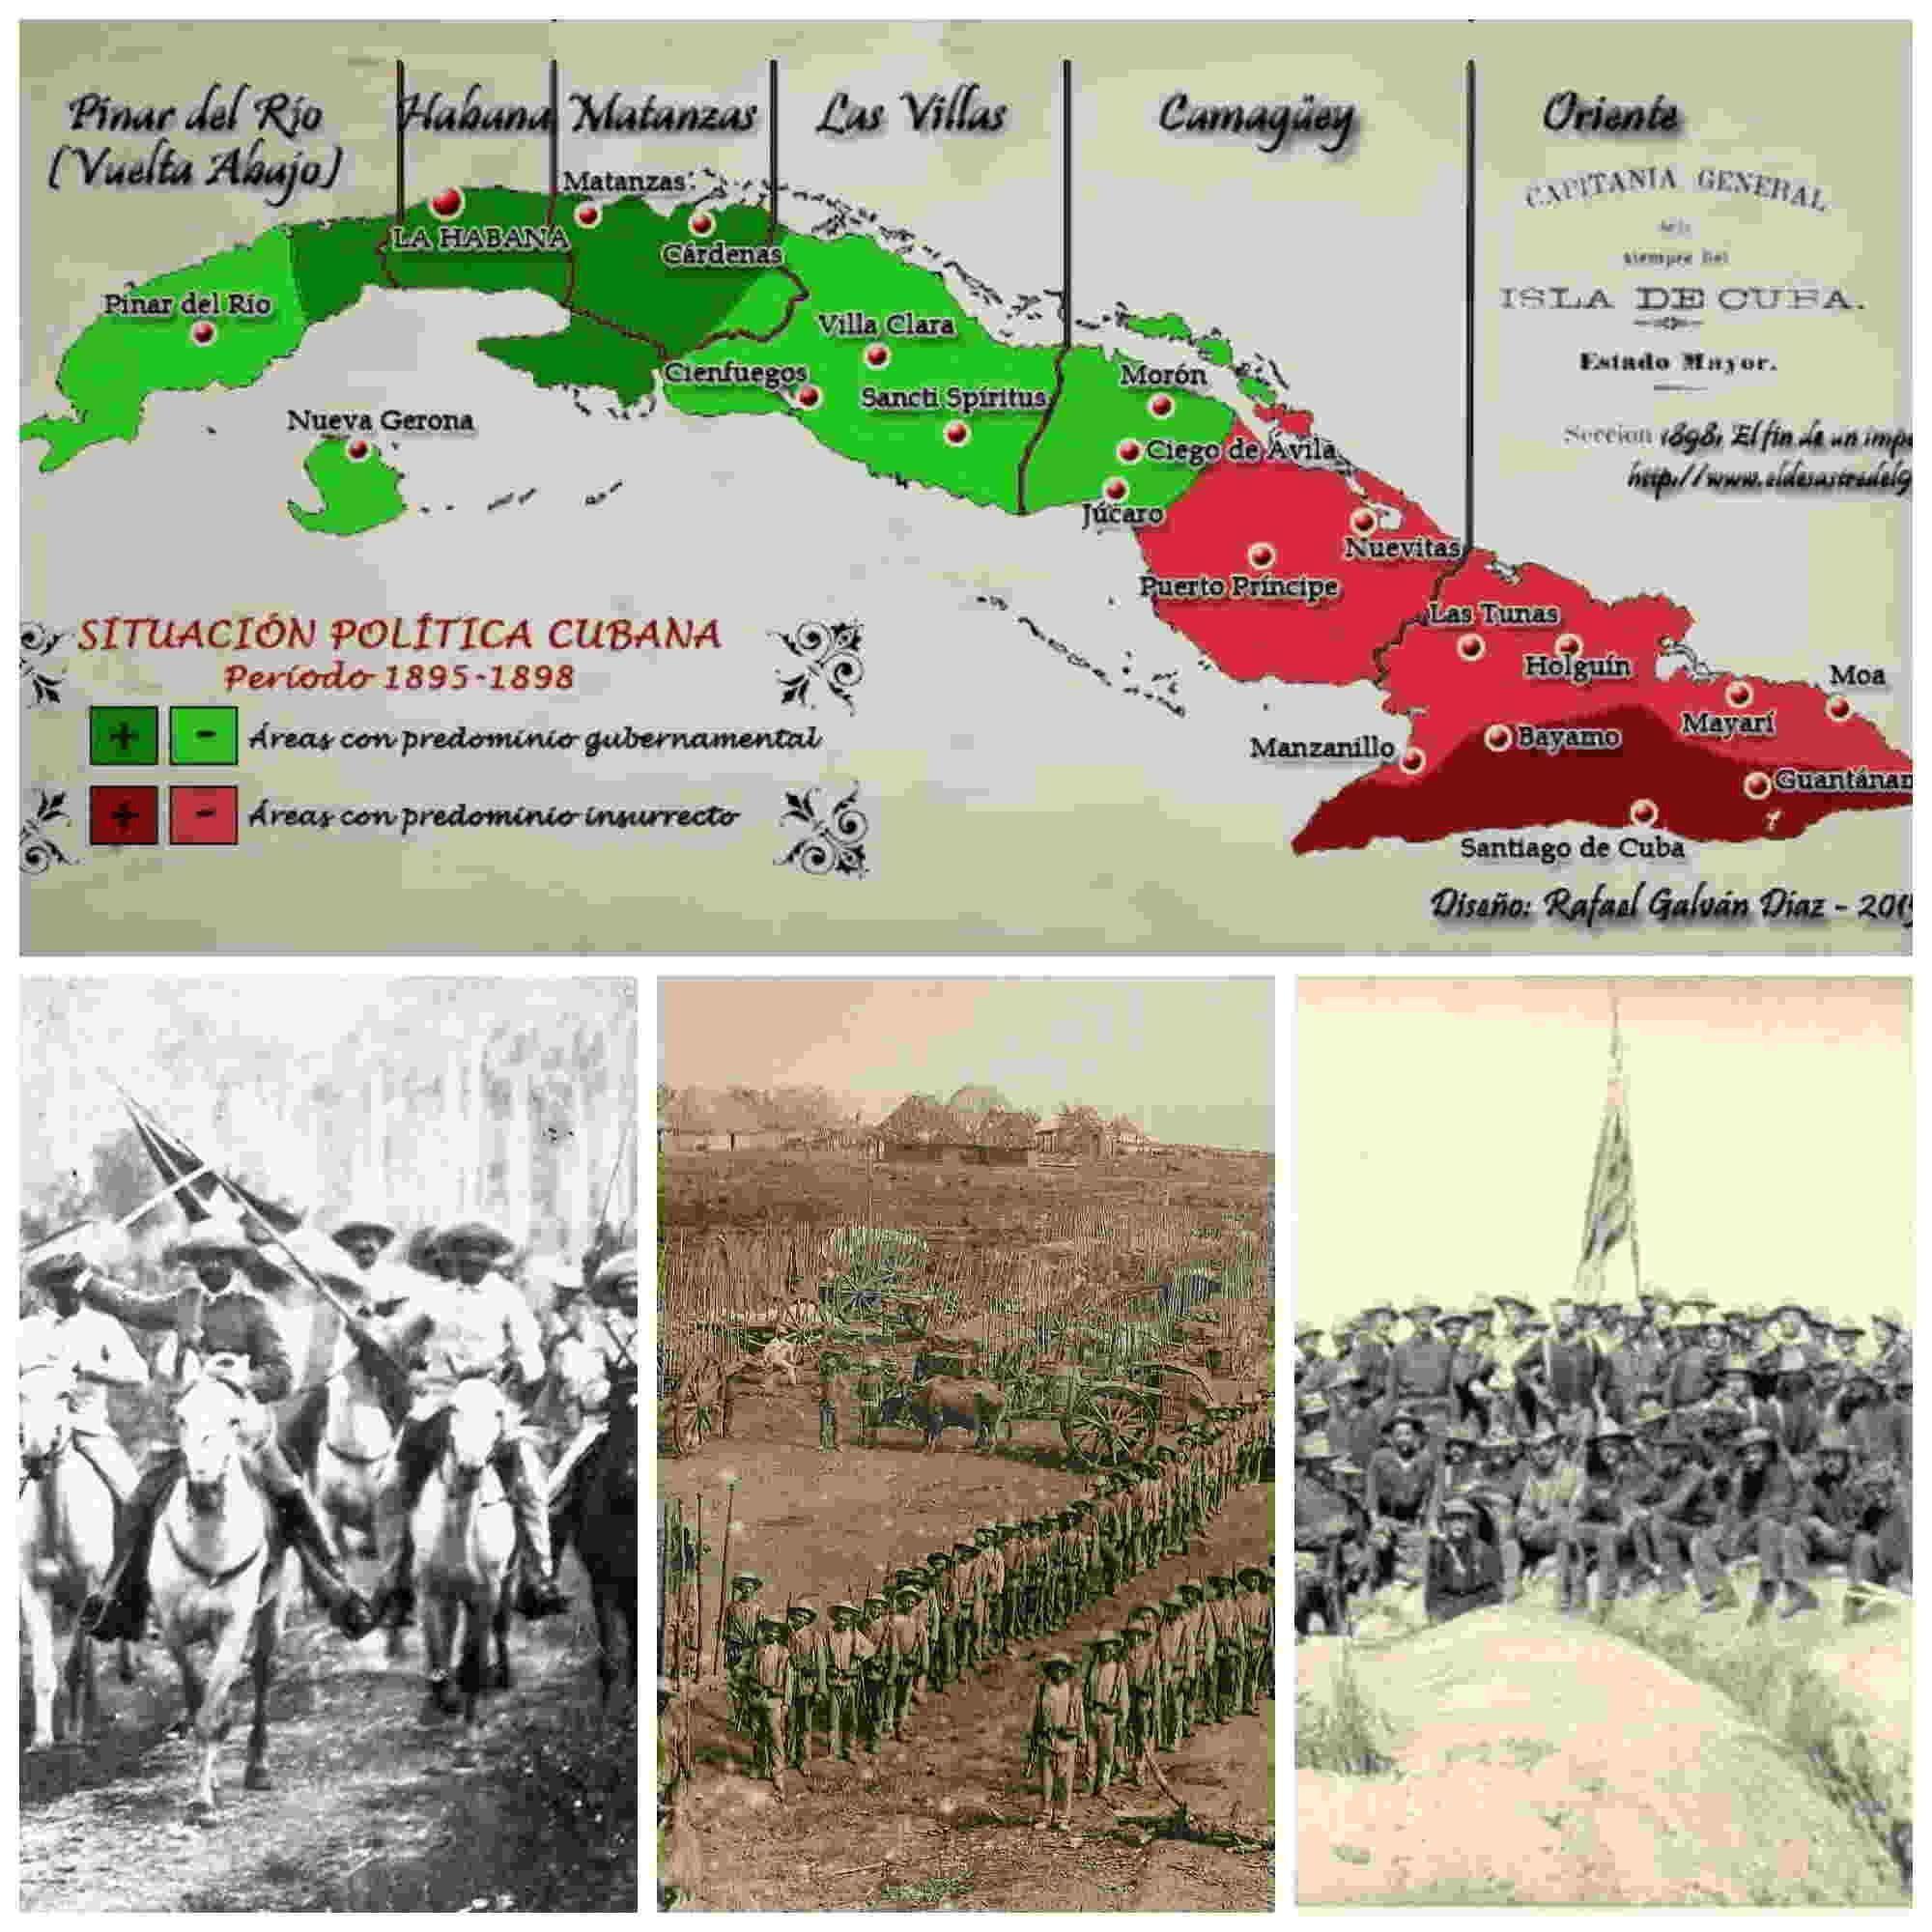 Santiago de Cuba, la campaña de 1898 (I #historyofcuba Santiago de Cuba, la campaña de 1898 (I) #historyofcuba Santiago de Cuba, la campaña de 1898 (I #historyofcuba Santiago de Cuba, la campaña de 1898 (I) #historyofcuba Santiago de Cuba, la campaña de 1898 (I #historyofcuba Santiago de Cuba, la campaña de 1898 (I) #historyofcuba Santiago de Cuba, la campaña de 1898 (I #historyofcuba Santiago de Cuba, la campaña de 1898 (I) #historyofcuba